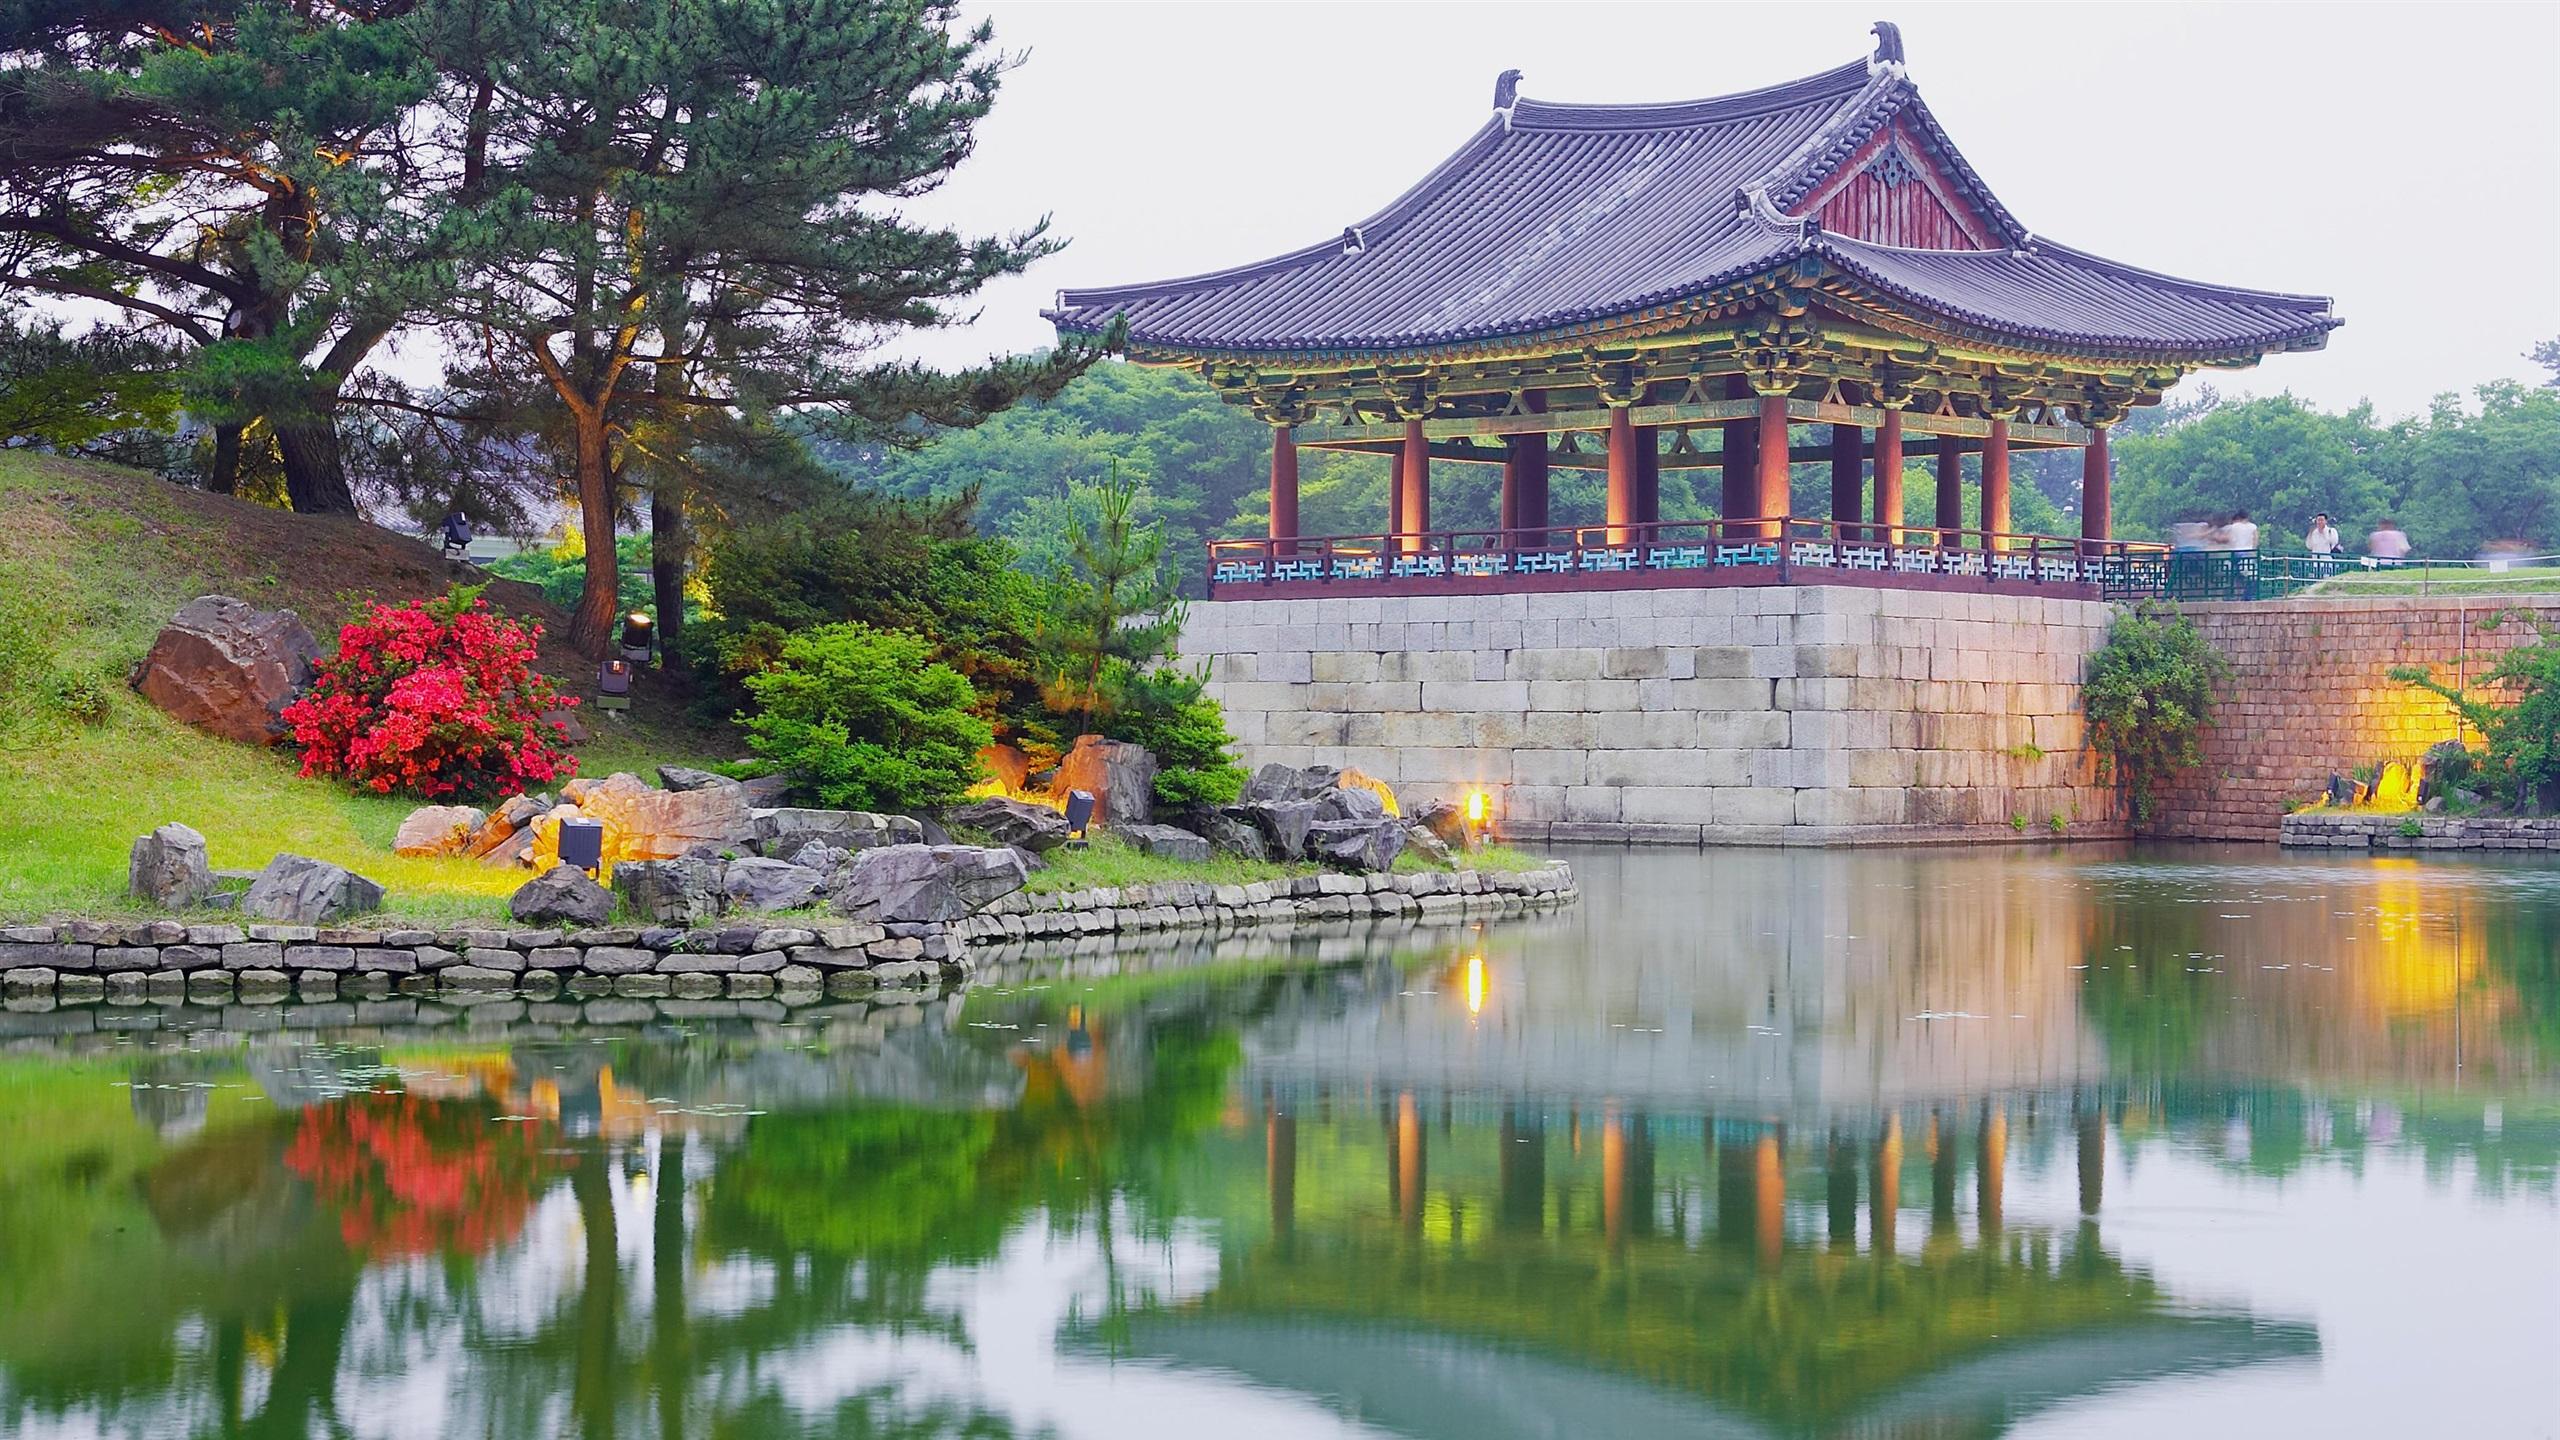 Wallpaper Korea Park Pavilion Lake Trees 2880x1800 HD Picture Image